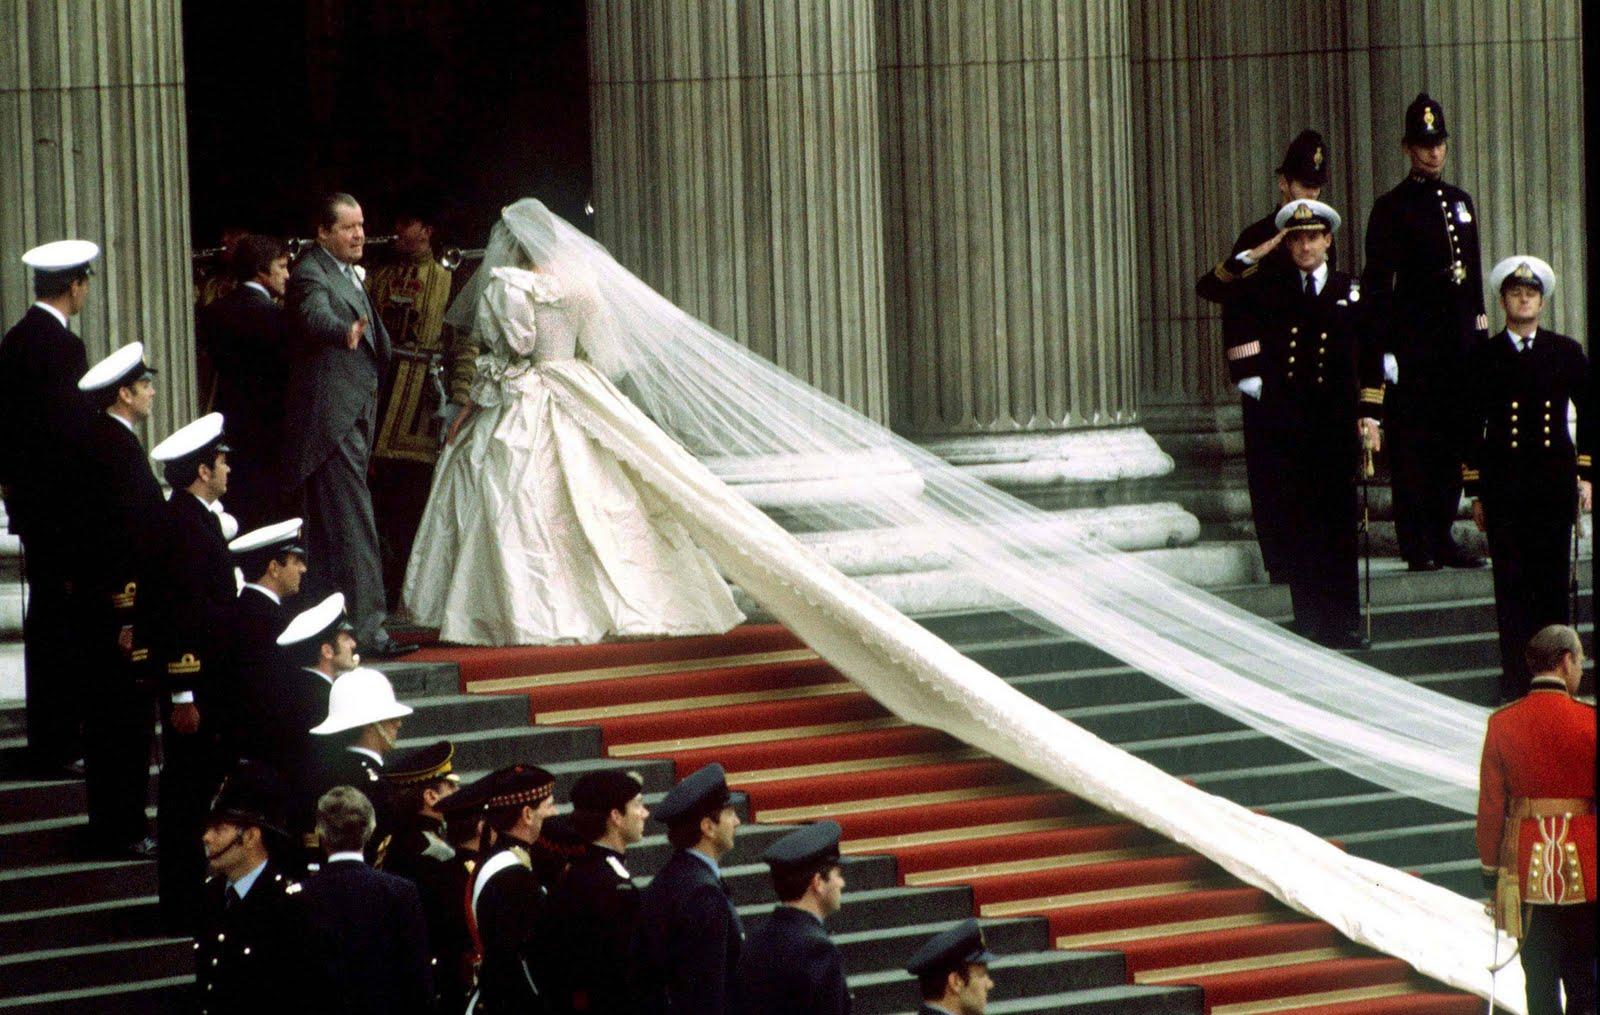 http://1.bp.blogspot.com/-I6hf_H6Dpn0/Tke9aSKgrrI/AAAAAAAADzY/Qz7t7kAhzGI/s1600/1981-Princess-Diana-Wedding-73399860.jpg